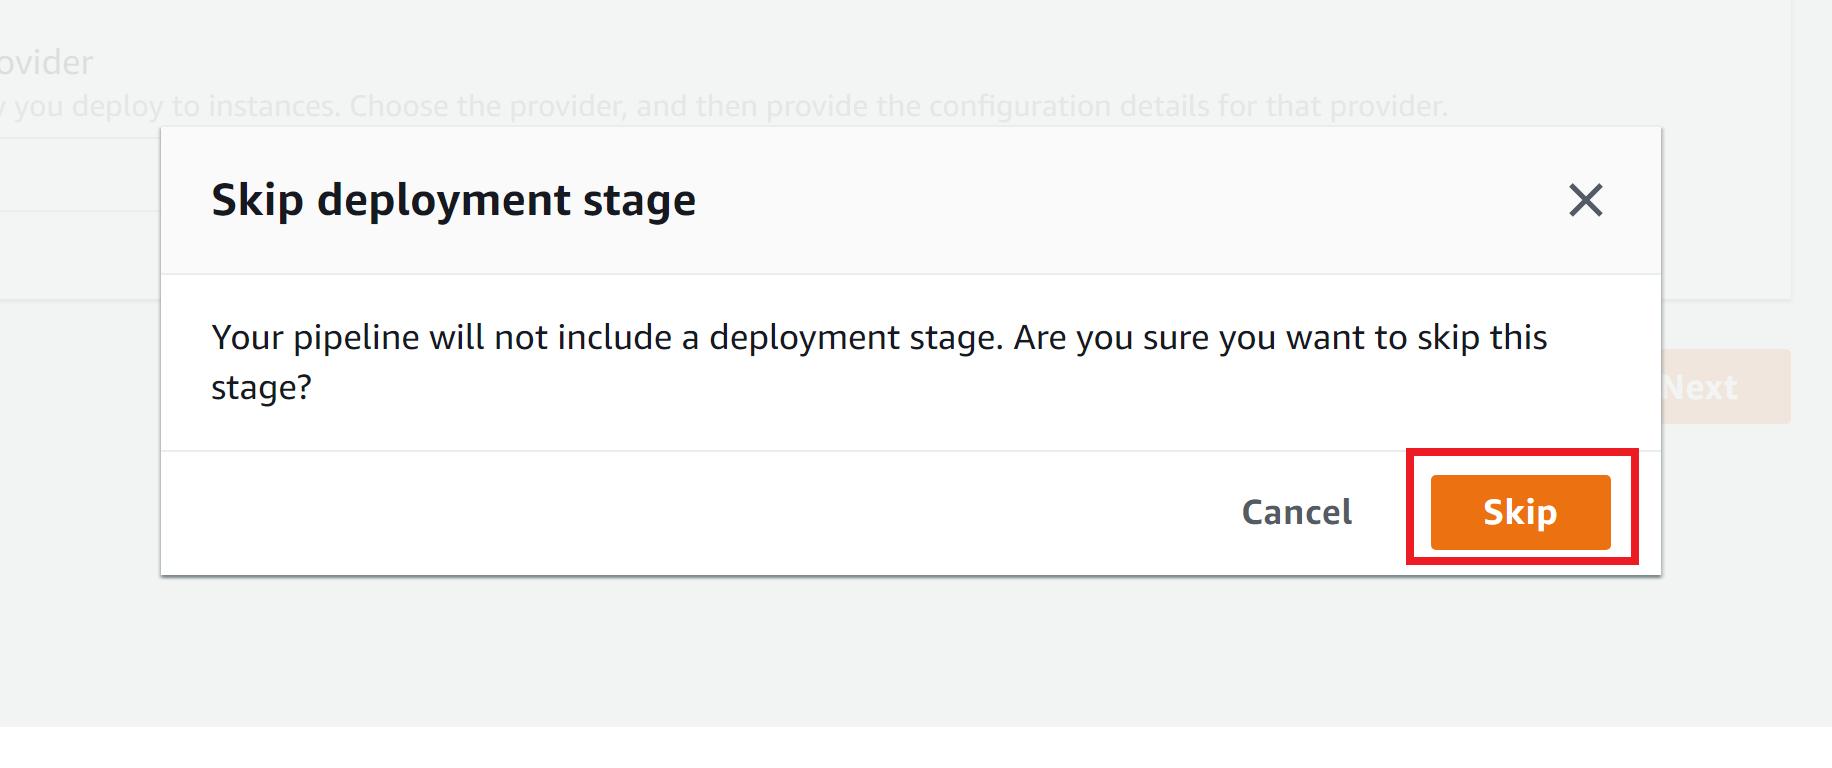 Confirm skip deployment stage